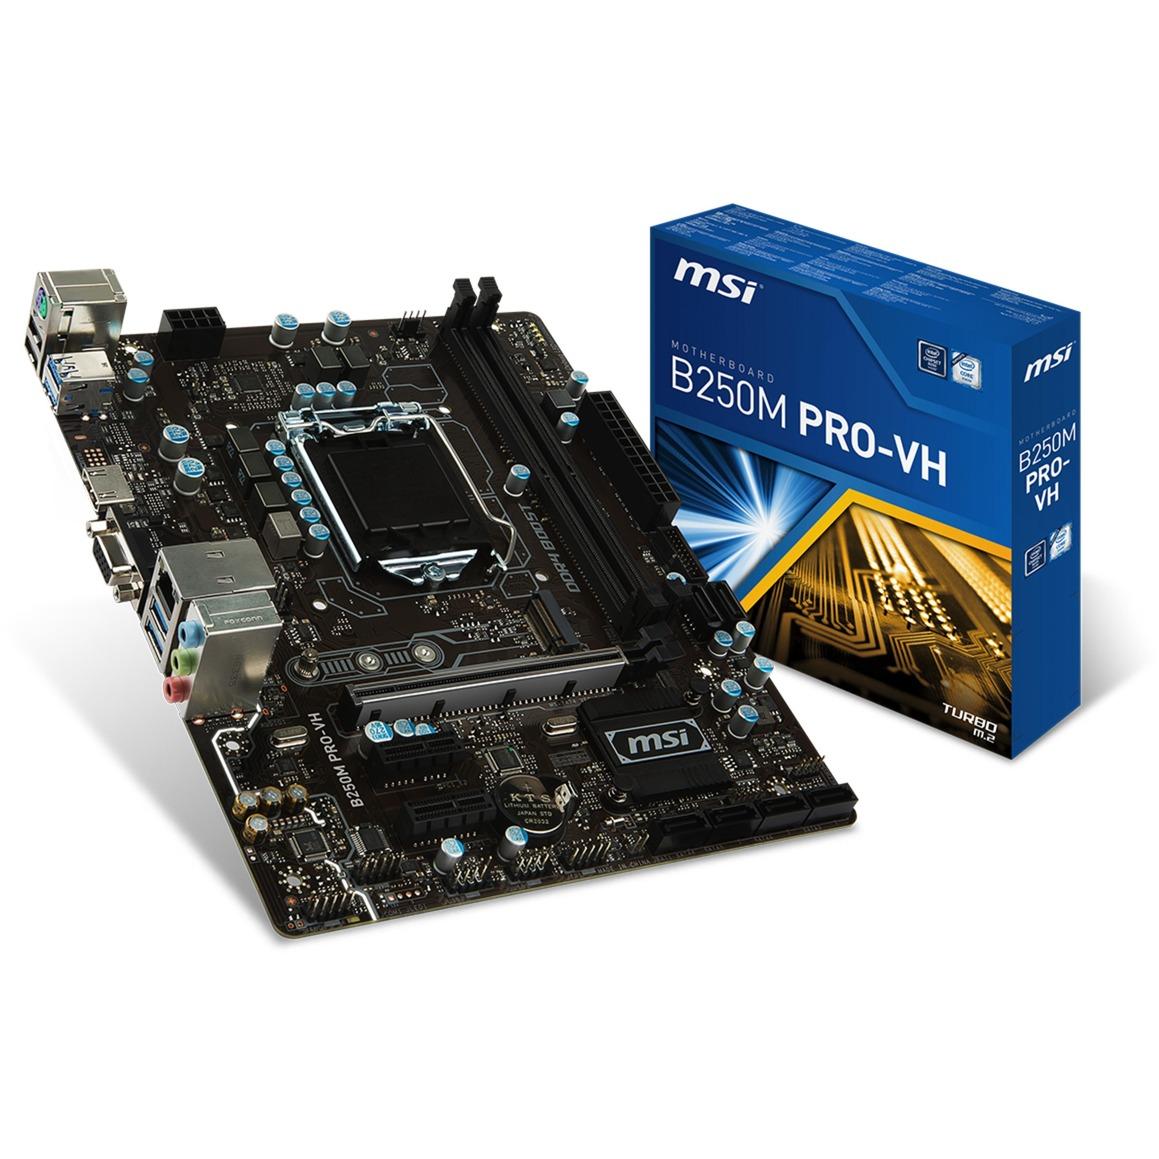 B250M PRO-VH LGA 1151 (Zócalo H4) Intel B250 micro ATX, Placa base